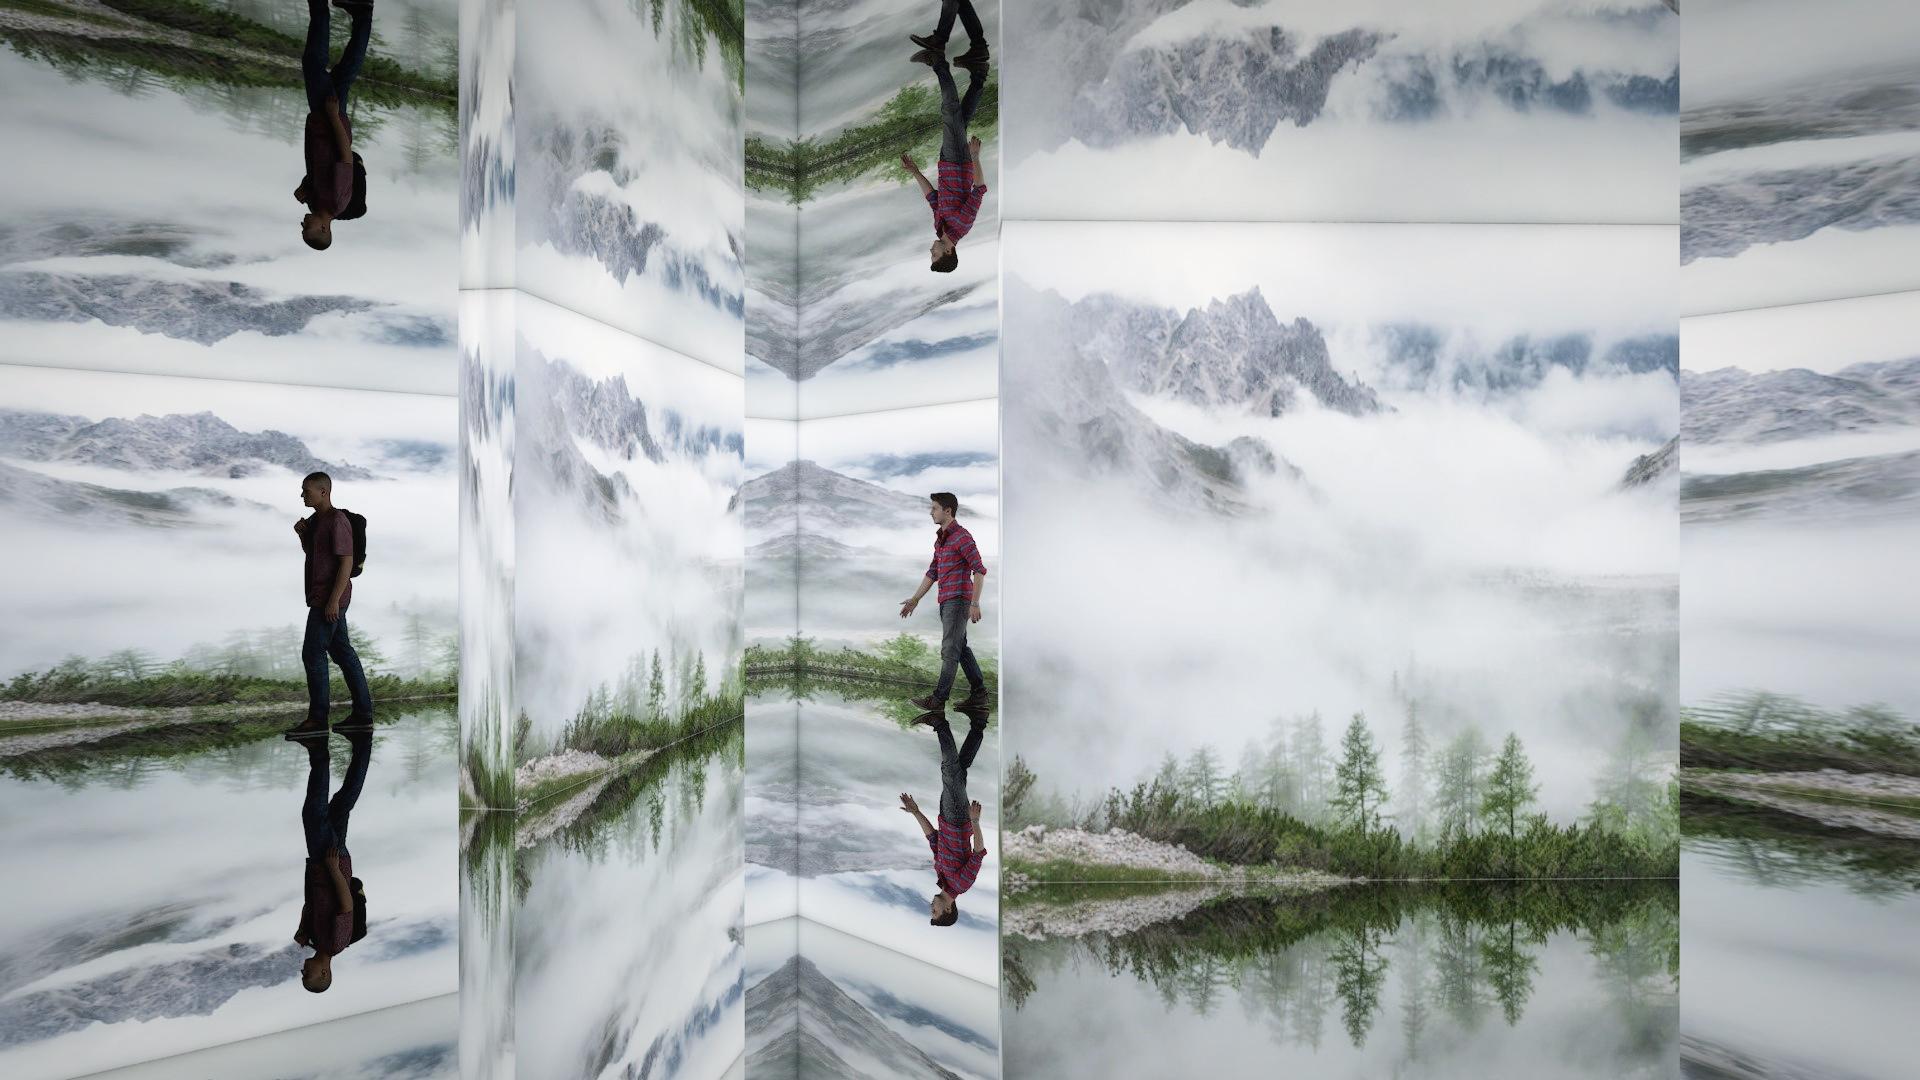 Lumen Spiegelsaal image